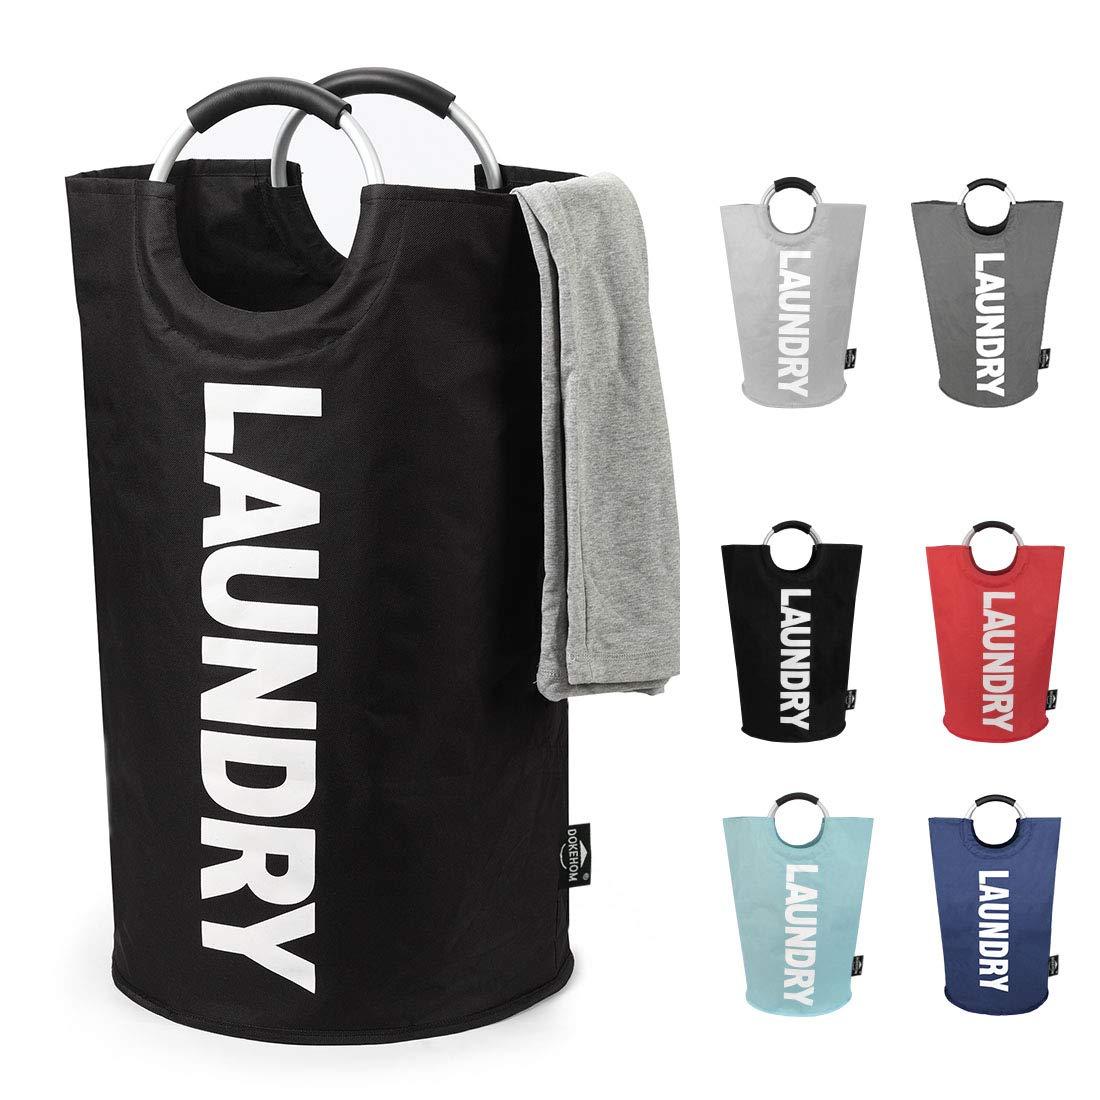 DOKEHOM DKA0001BK2 Large Laundry Basket (6 Colors, L and XL), Collapsible Fabric Laundry Hamper, Foldable Clothes Bag, Folding Washing Bin (Black, L)